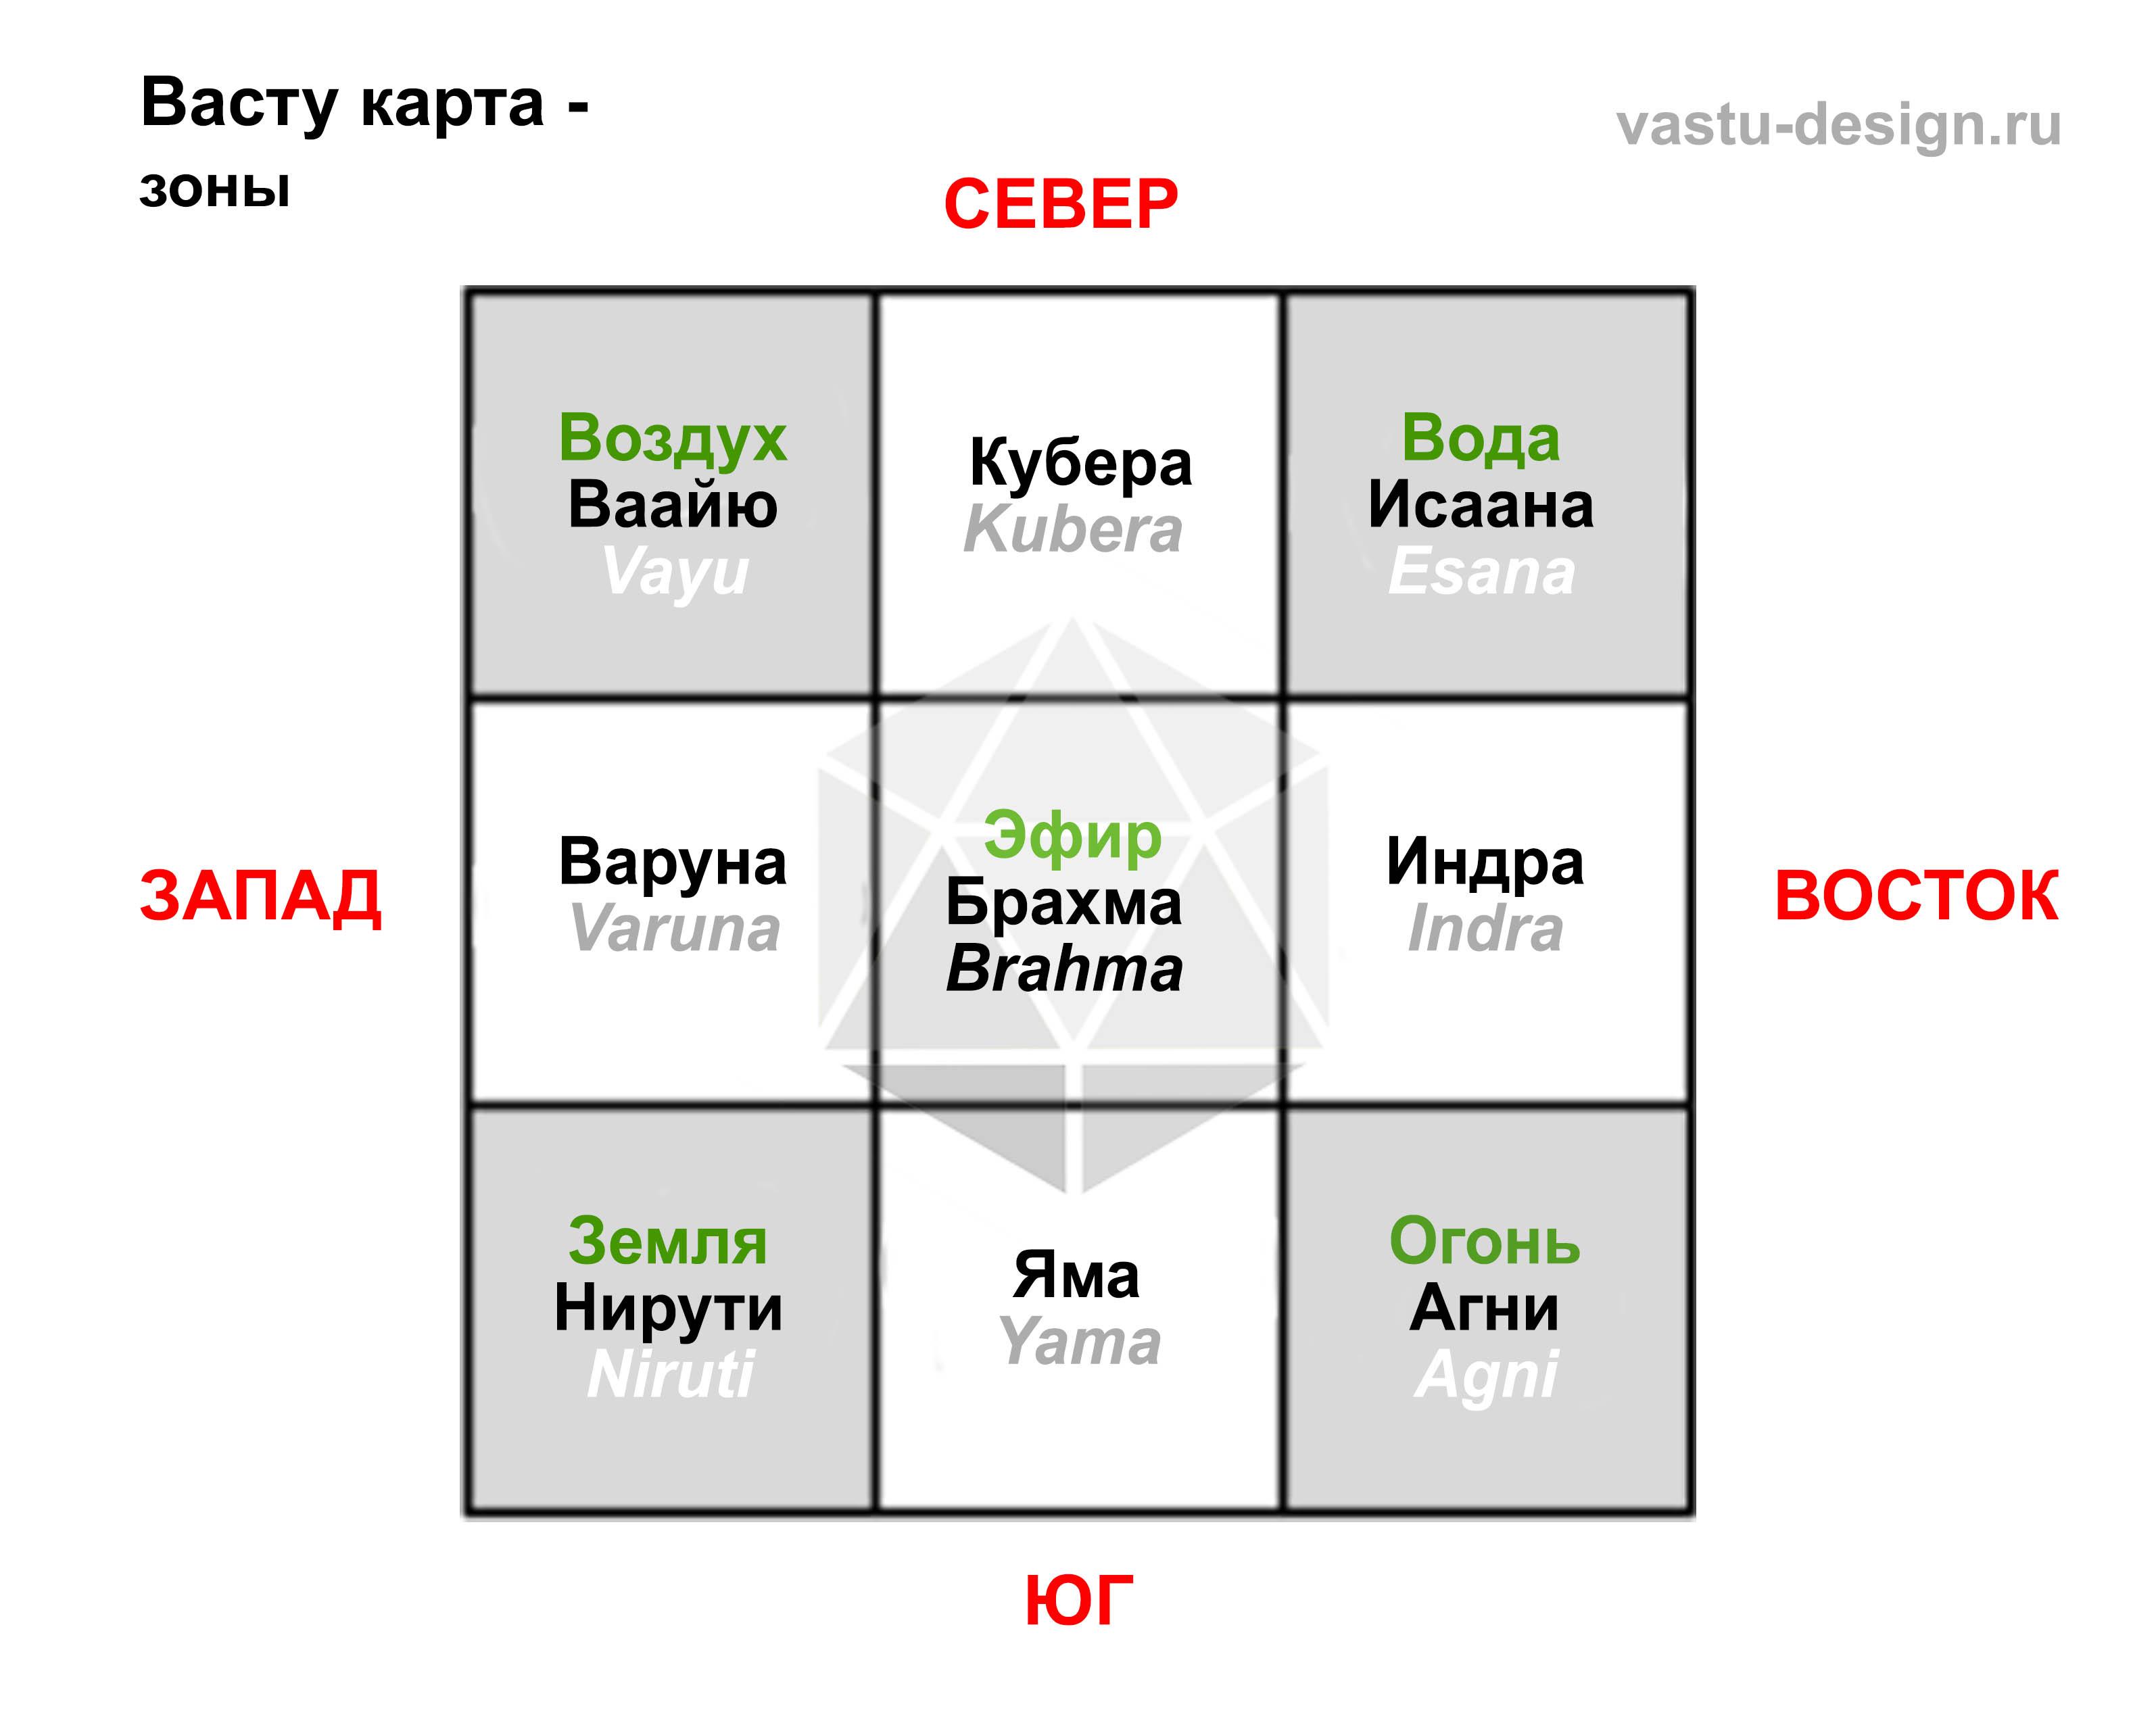 Васту-шастра - наука об архитектуре / блог архитектора дмитрия новикова